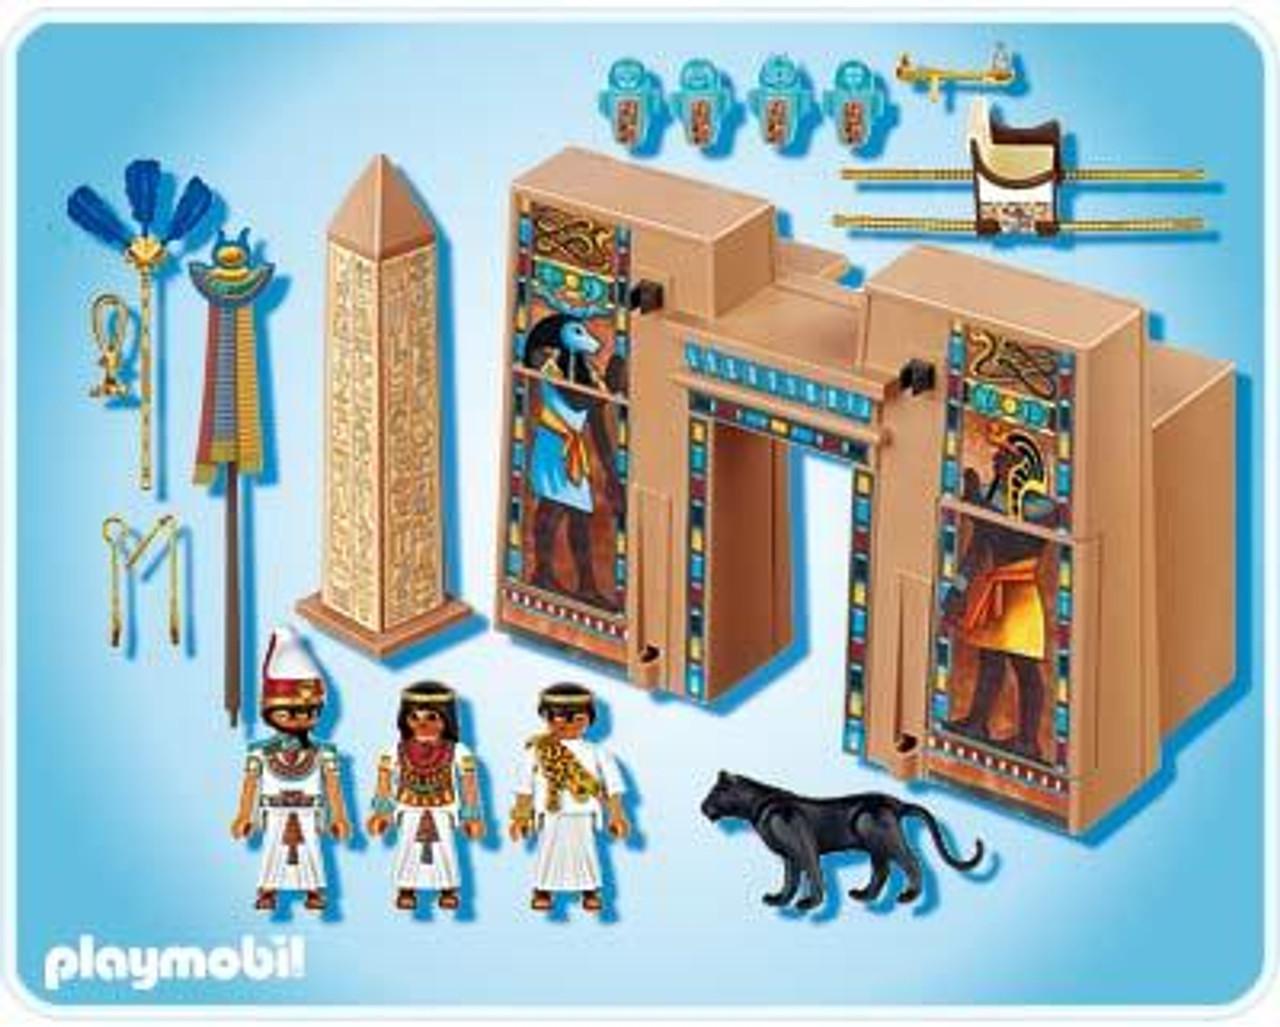 Playmobil Romans & Egyptians Pharaoh's Temple Set #4243